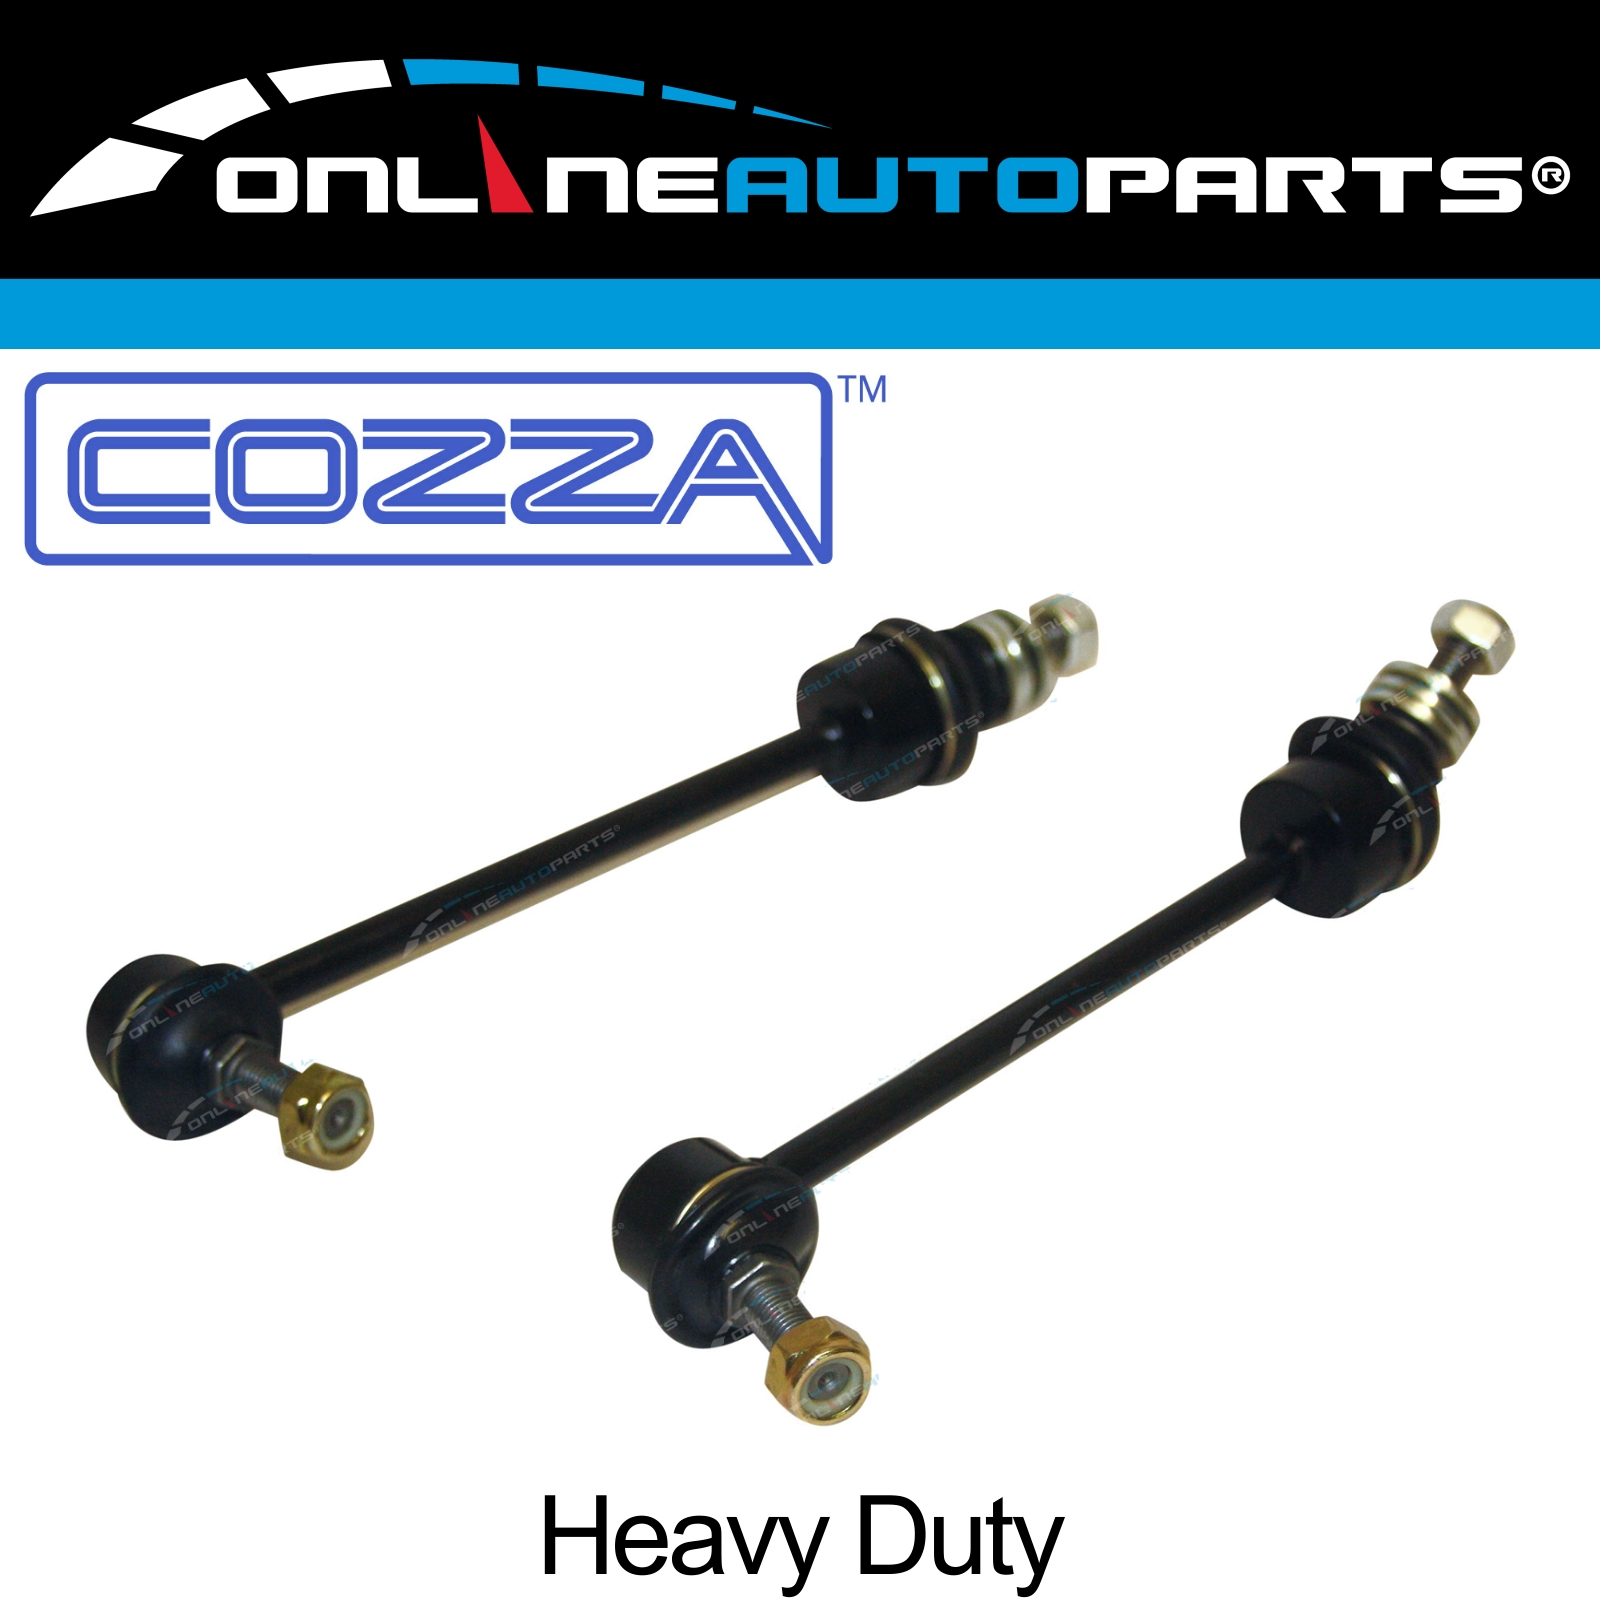 *OEM Quality Sway Bar Link Set FR For Holden Commodore Vx Series 1 5.7l Gen3 Ls1